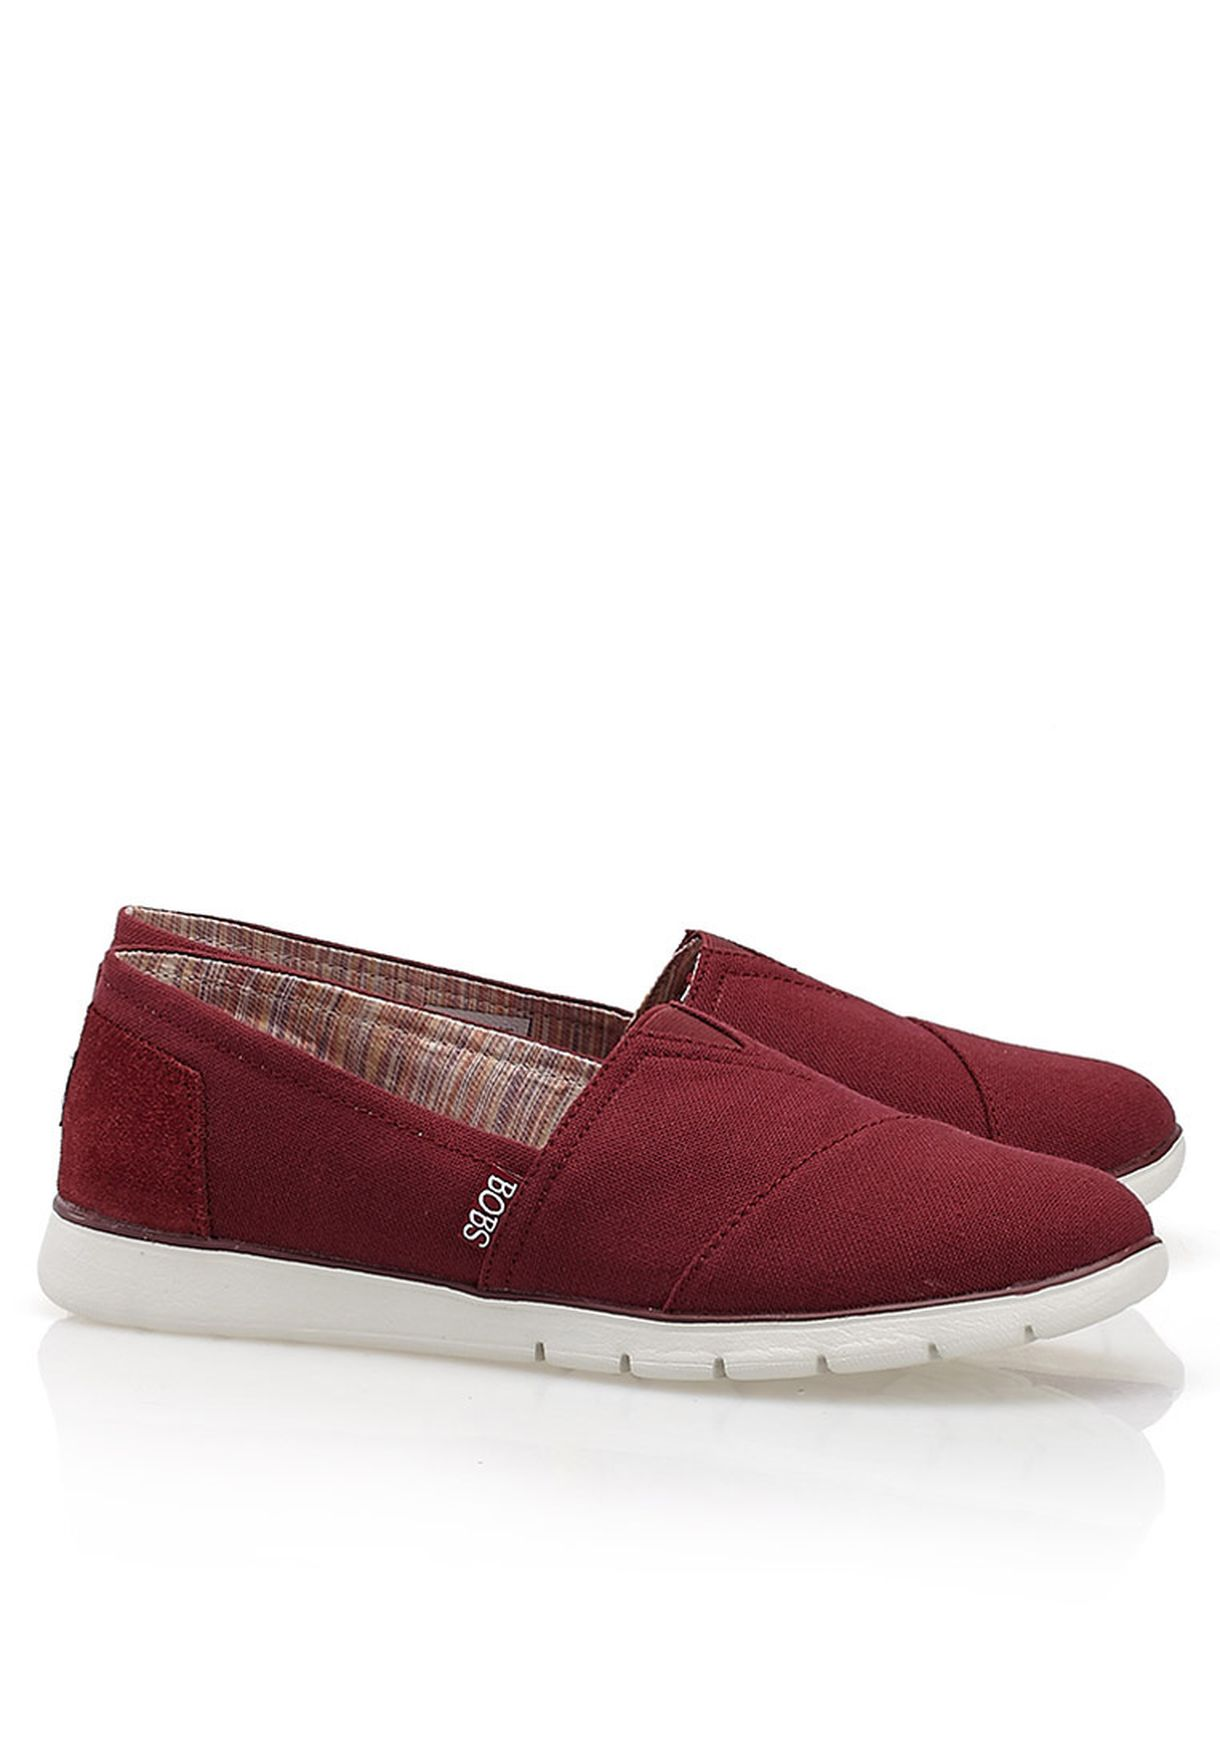 Shop Skechers red Pureflex U Tum Slip Ons 33607-BURG for Women in ... 58913754e8d7